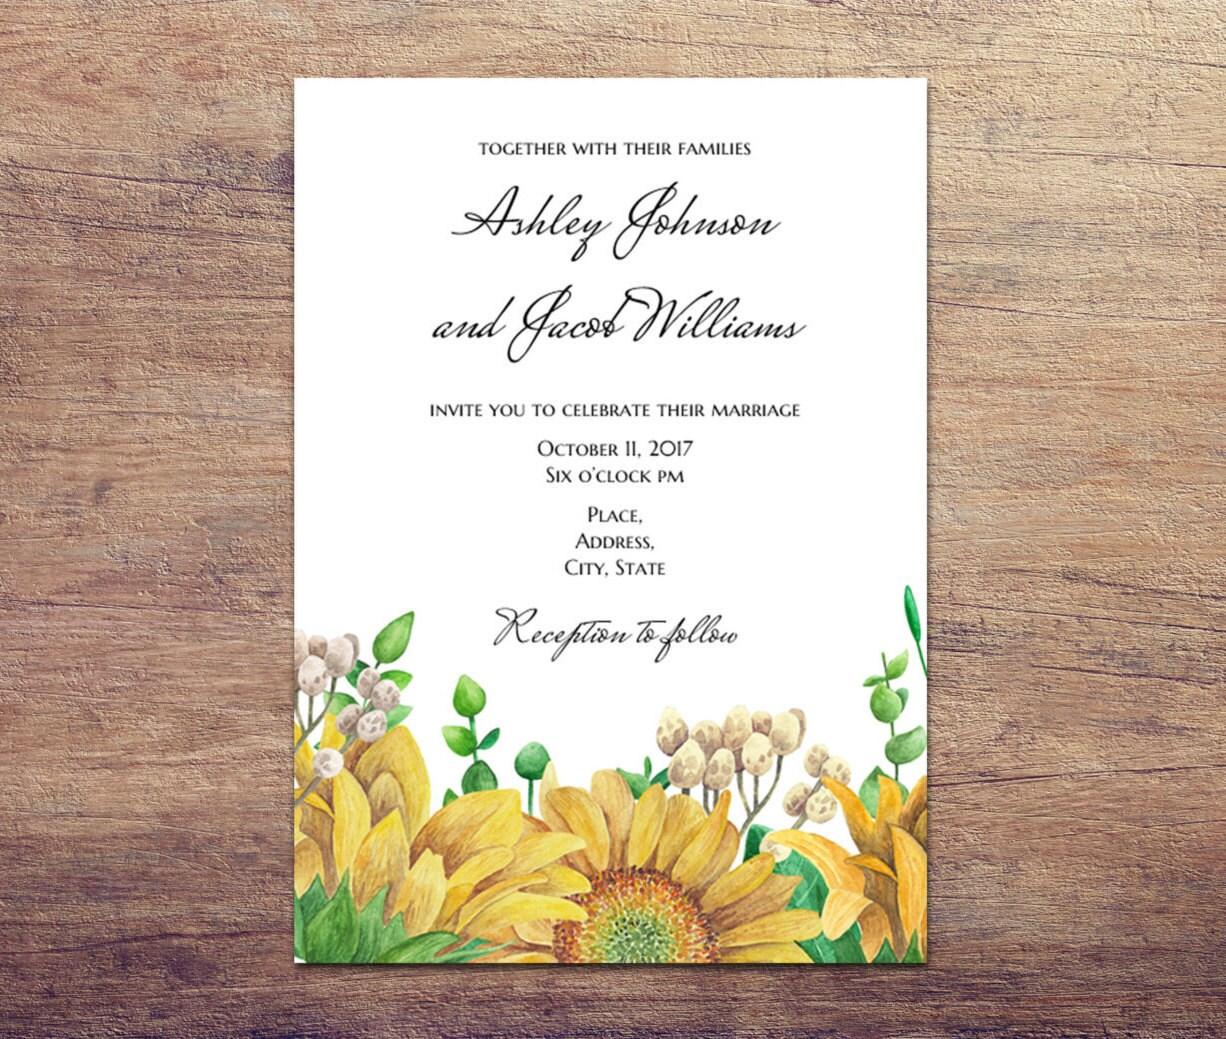 Country Wedding Invitation Templates: Rustic Wedding Invitation Template Country Wedding